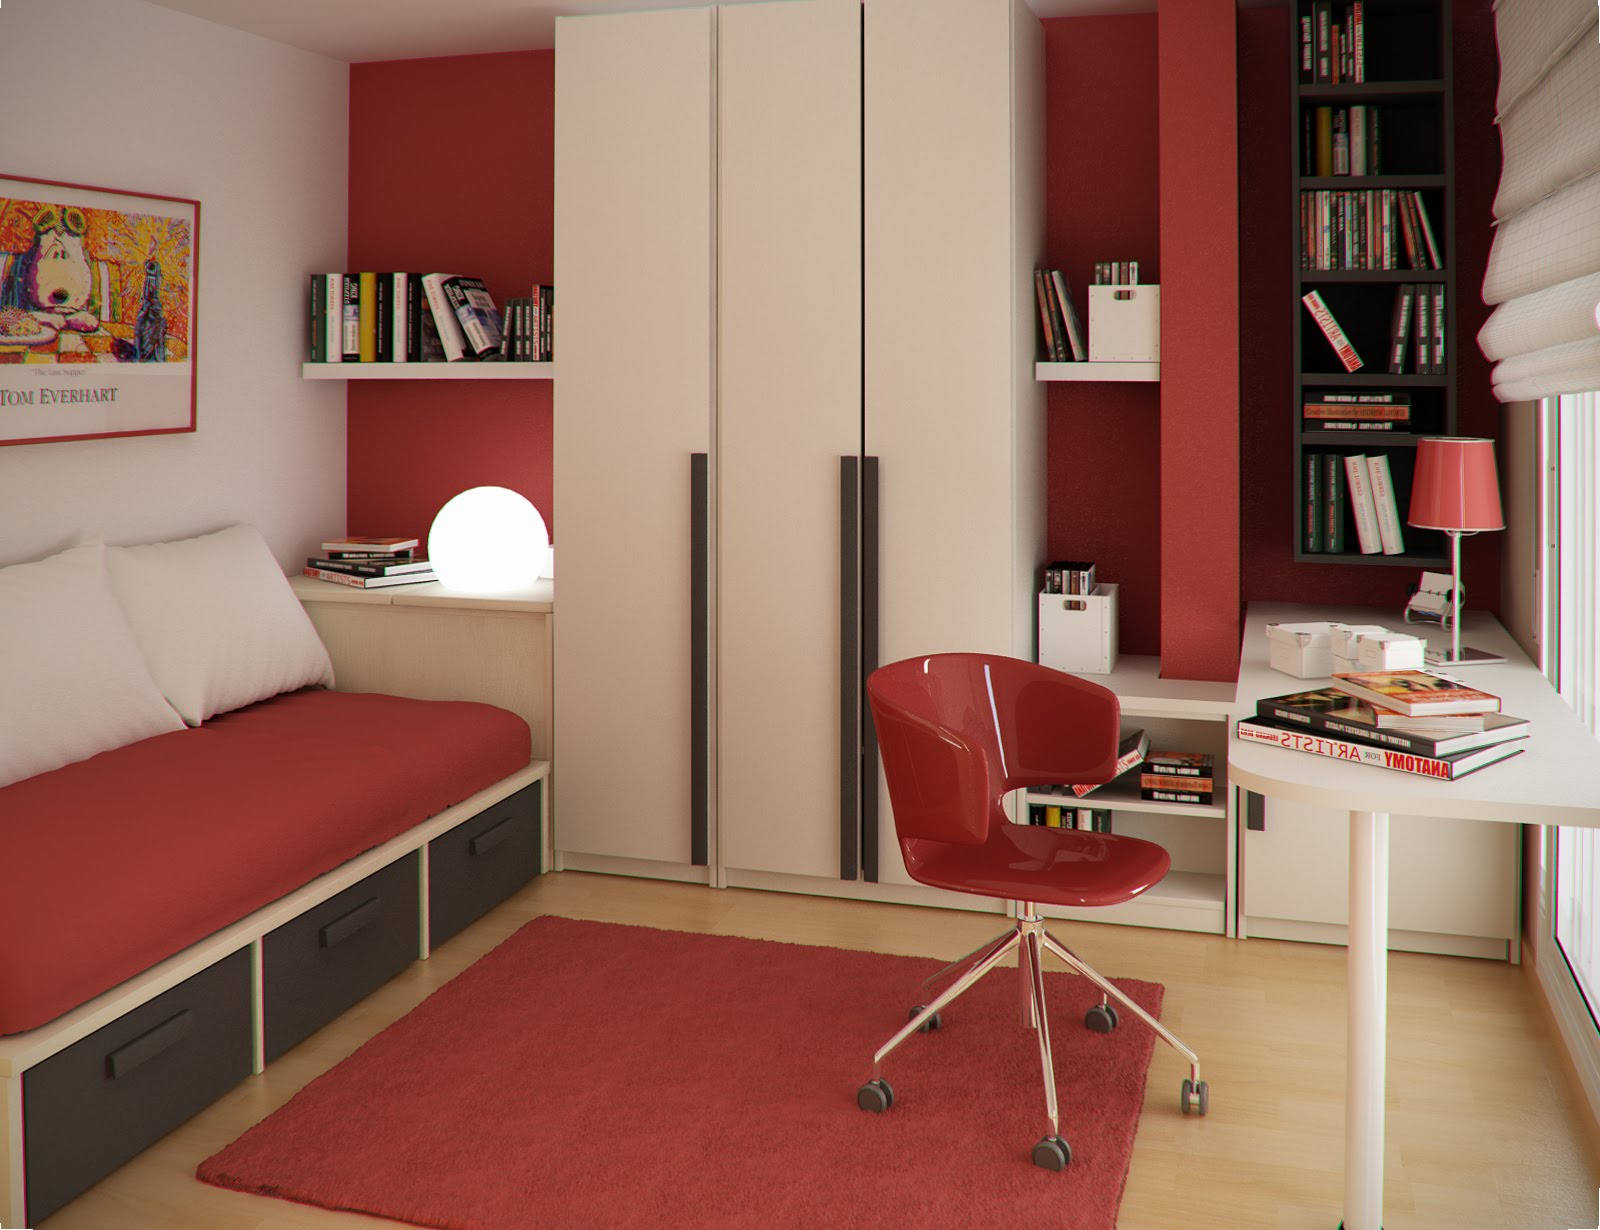 Briar Home/Lilith's Room